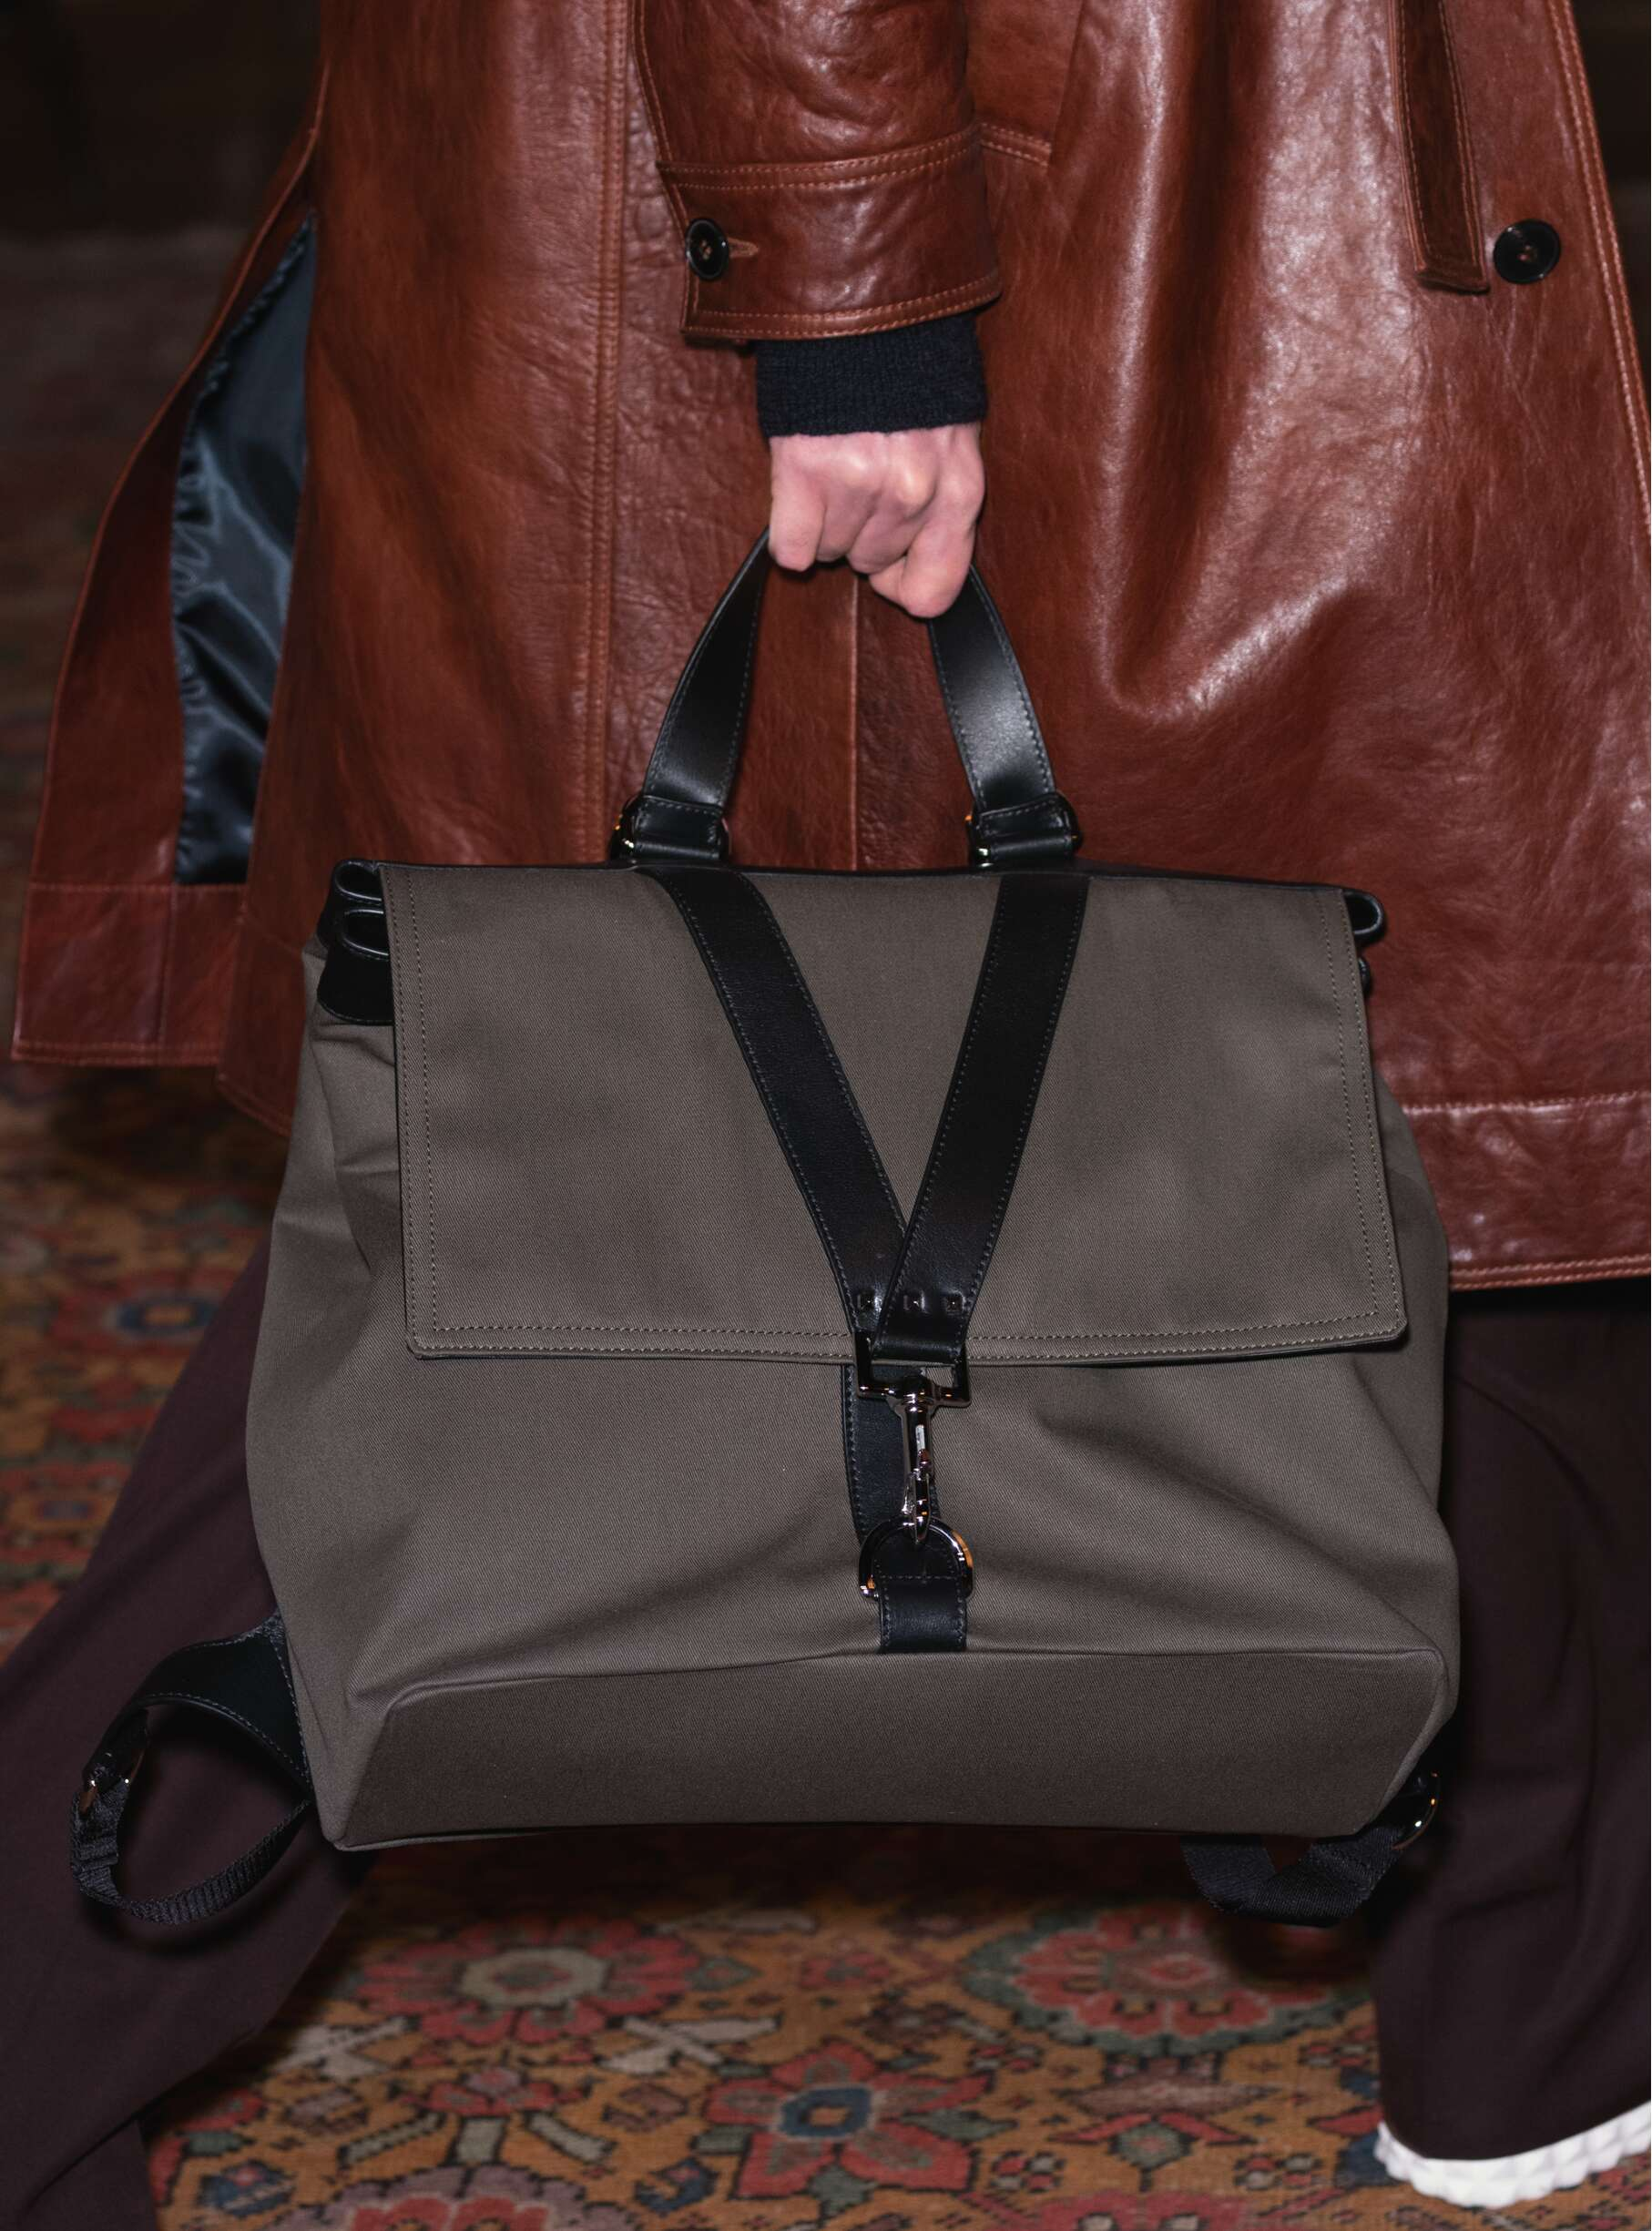 Valentino Bag Style